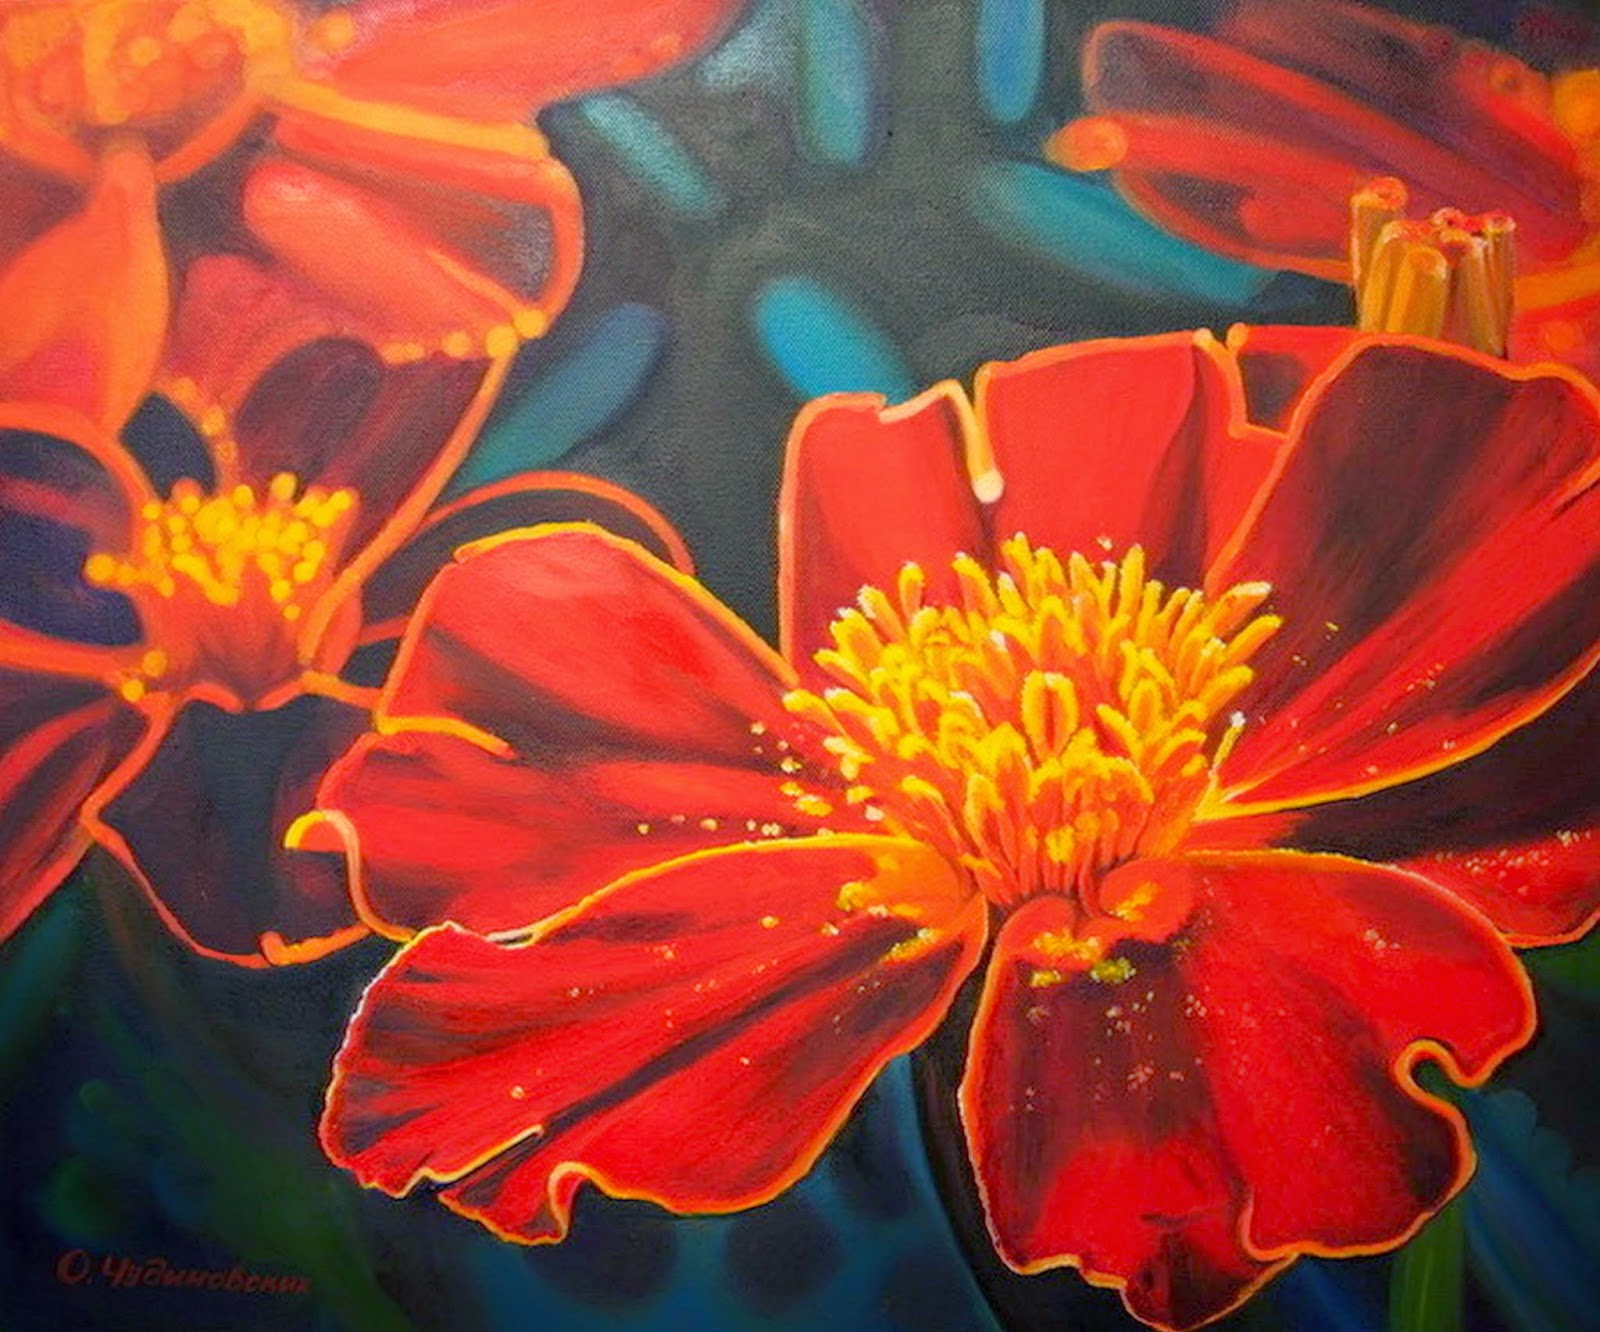 Imágenes Arte Pinturas: Ideas Para Pintar Cuadros de Flores ...